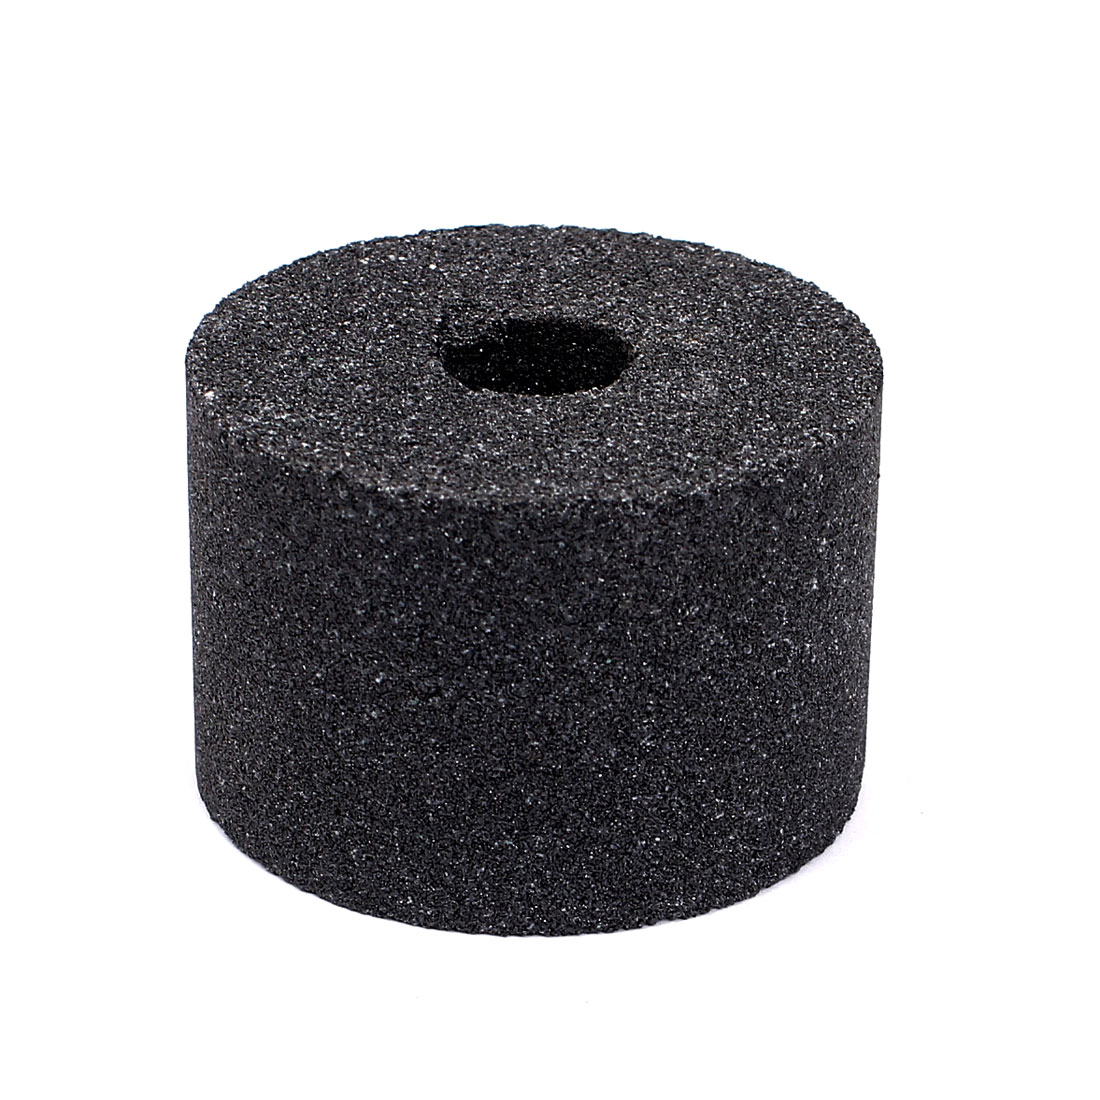 60mm x 40mm x 16mm 80 Grit Carborundum Abrasives Cylinder Cup Grinding Wheel